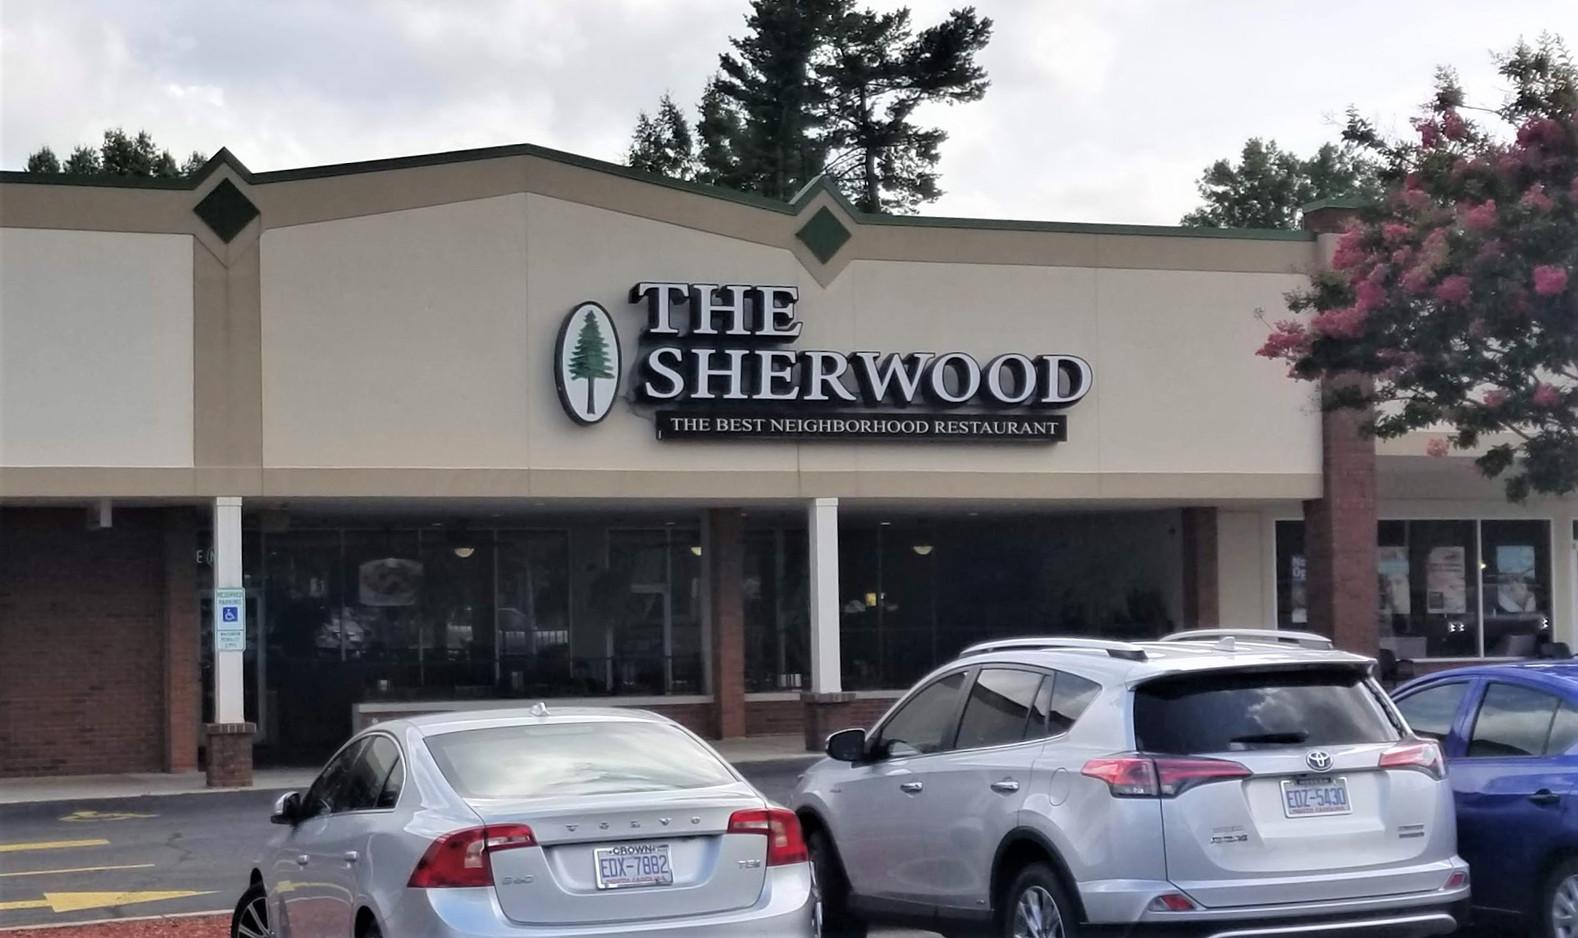 The Sherwood Restaurant